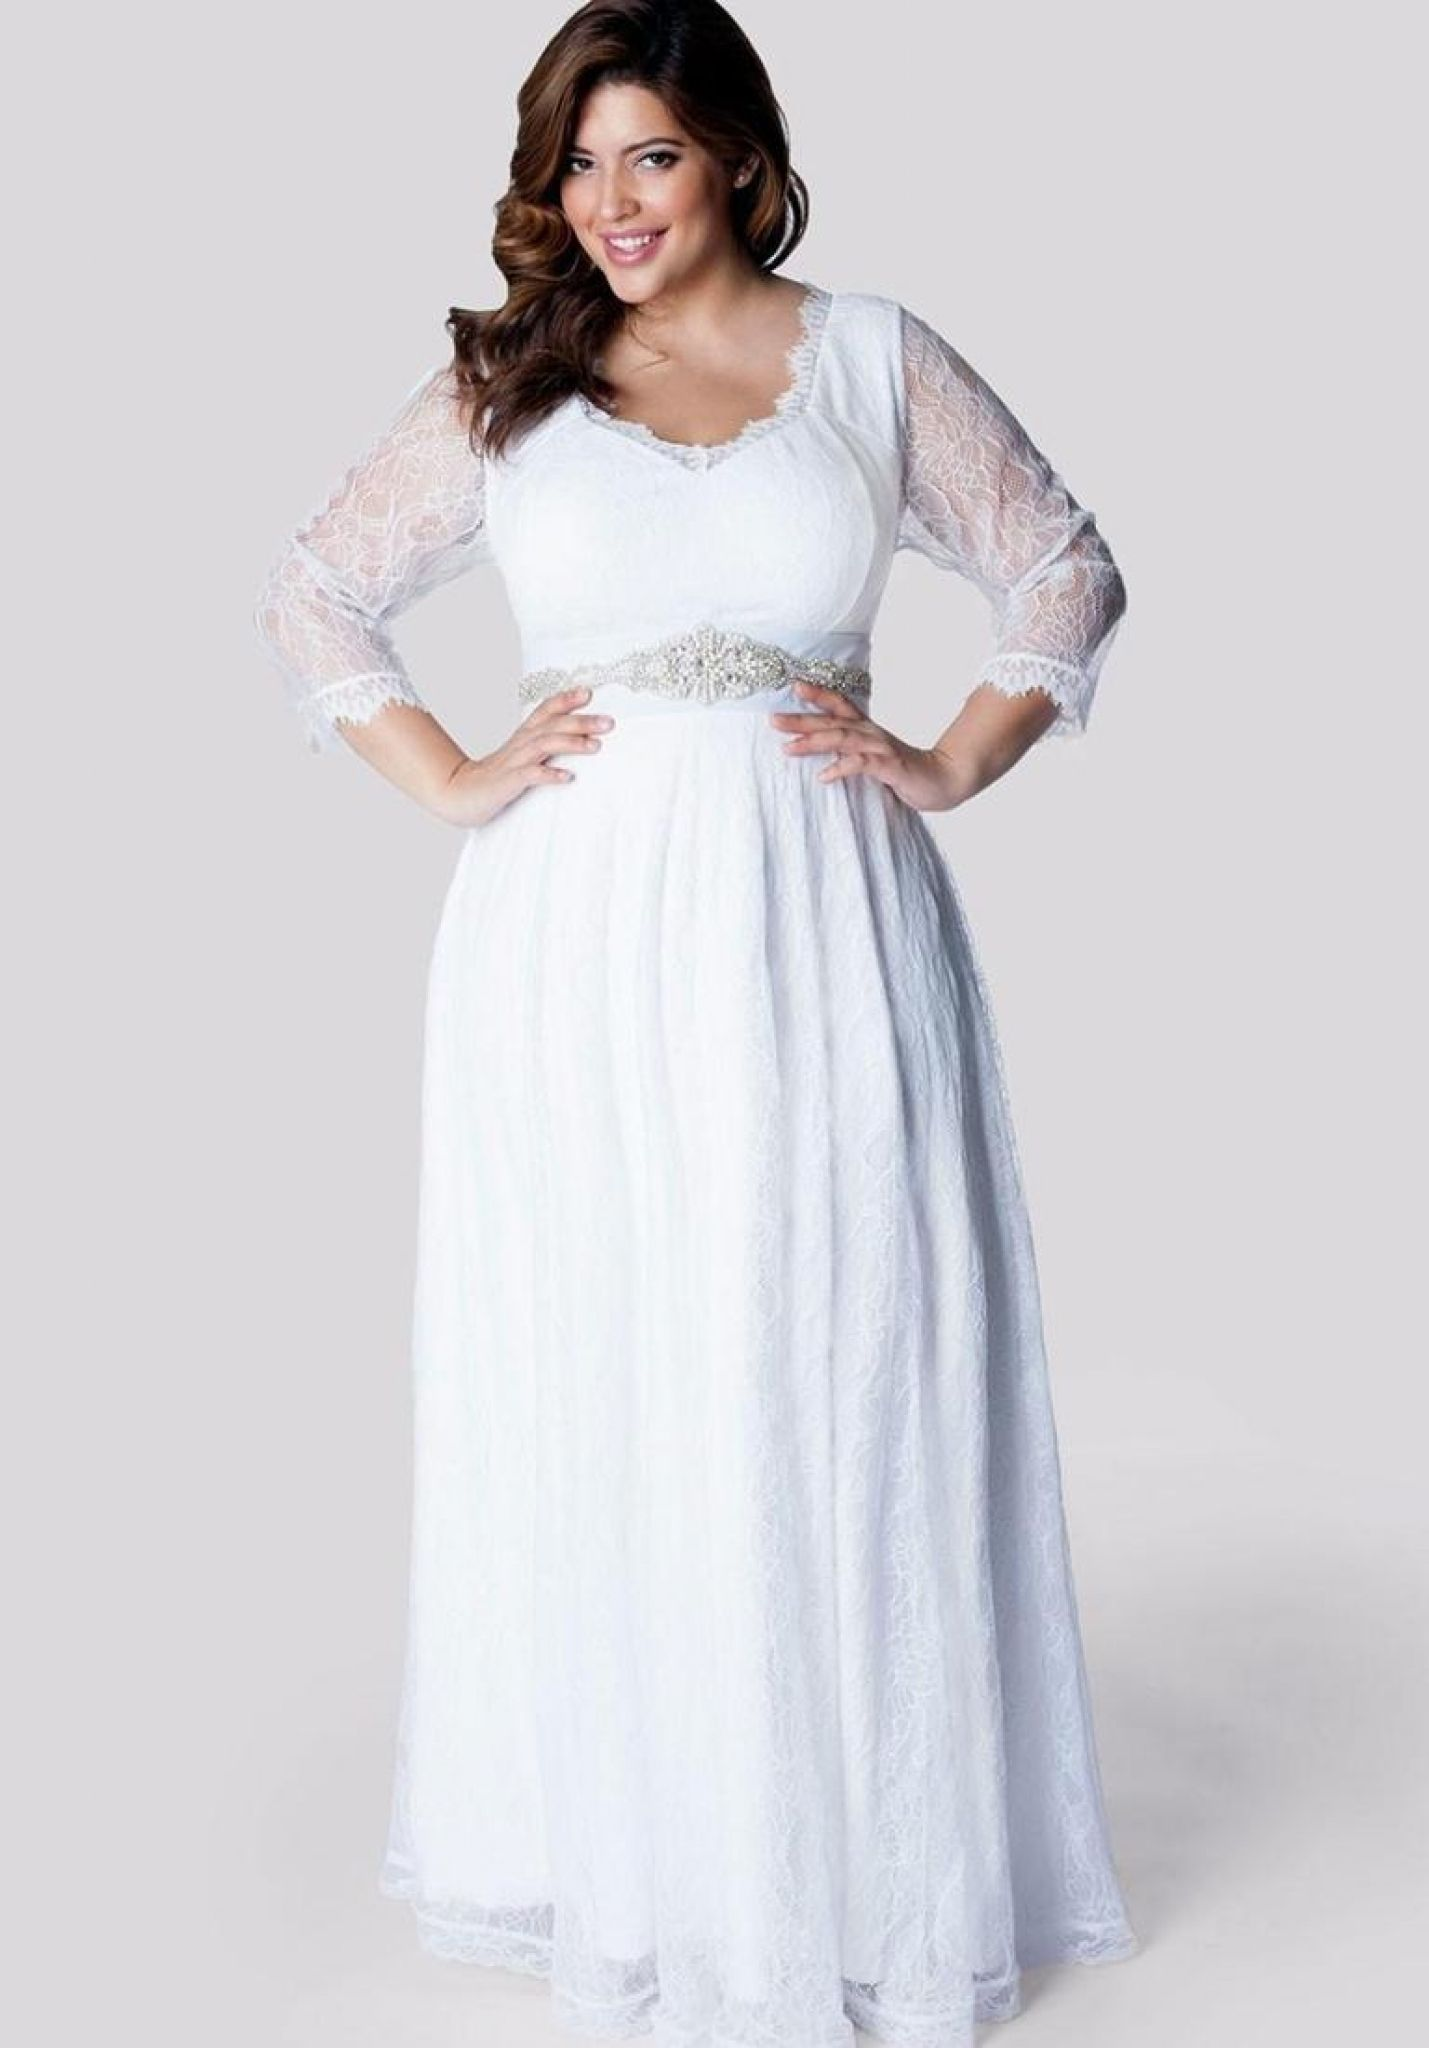 modest plus size wedding dresses - wedding dresses for the mature ...